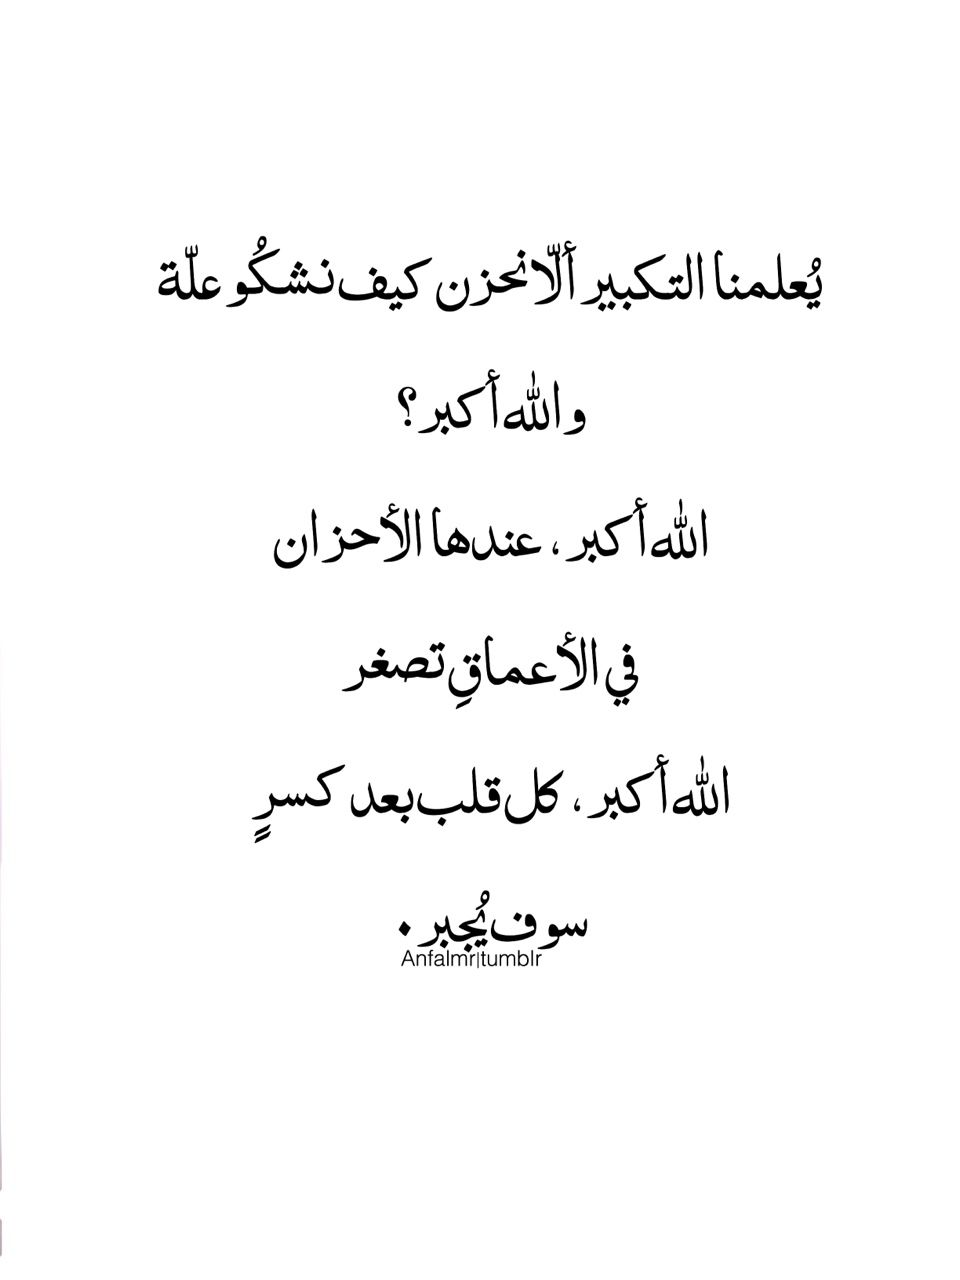 منى الشامسي Quran Quotes Funny Words Best Friendship Quotes